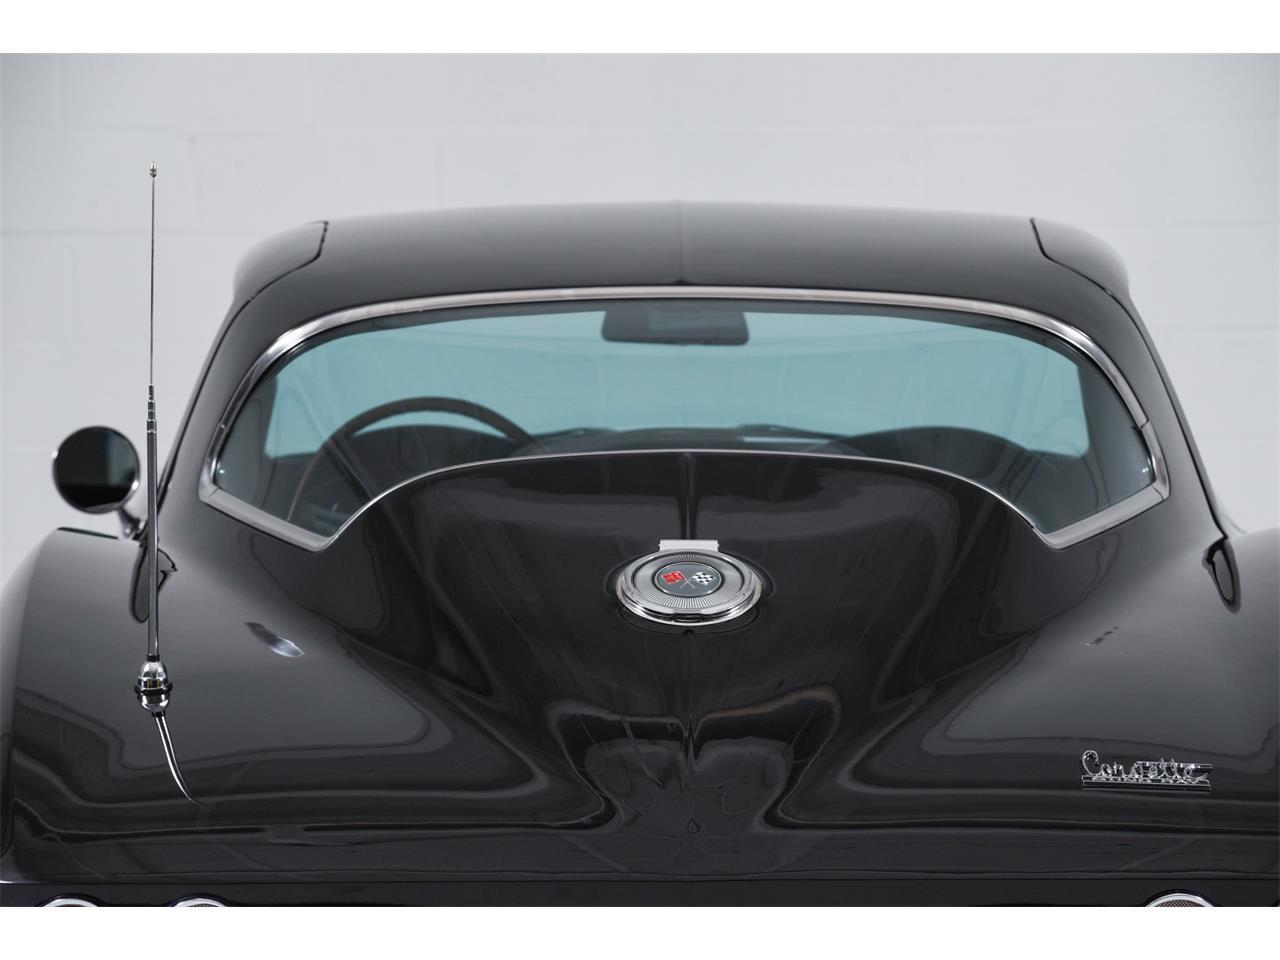 Large Picture of '66 Chevrolet Corvette - $79,900.00 - Q1WK